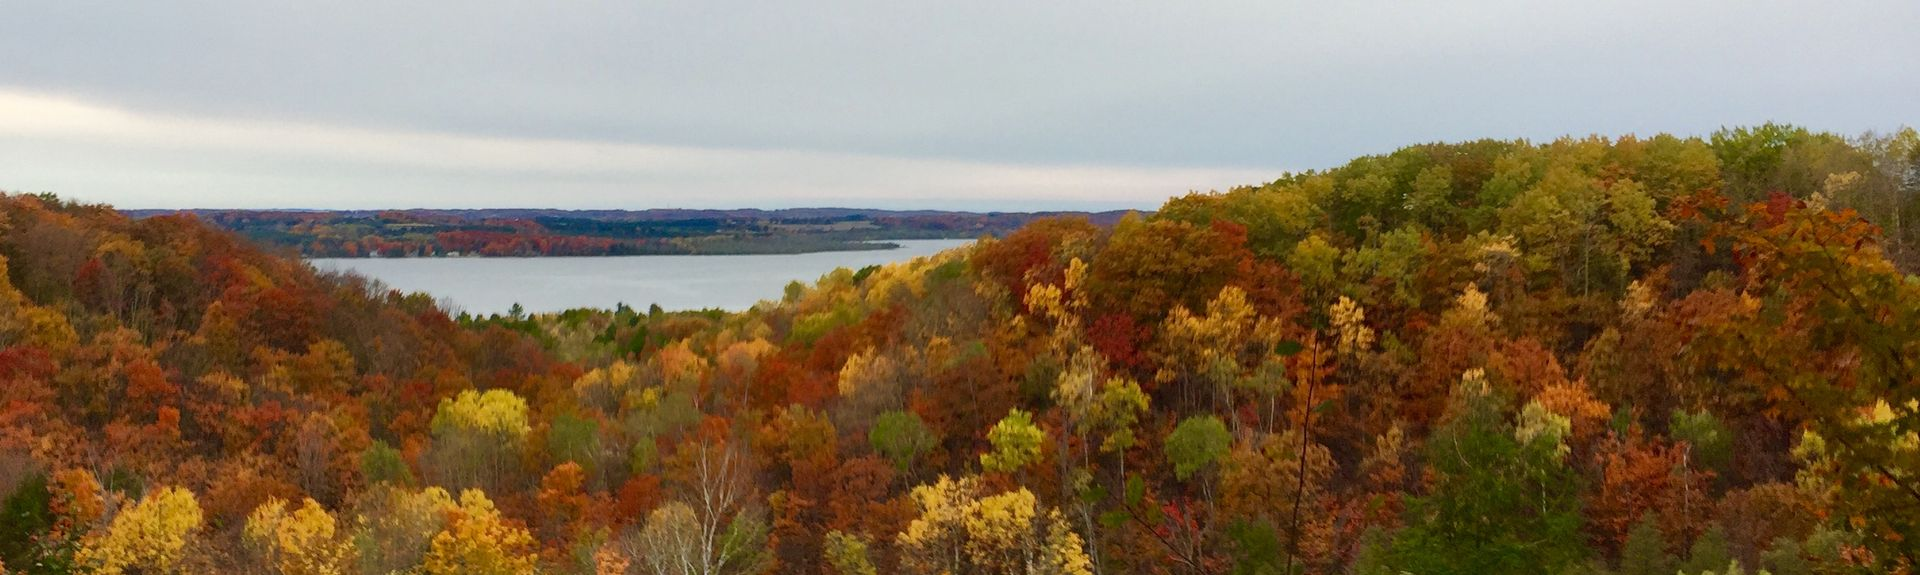 Intermediate Lake, Central Lake, Michigan, Forente Stater